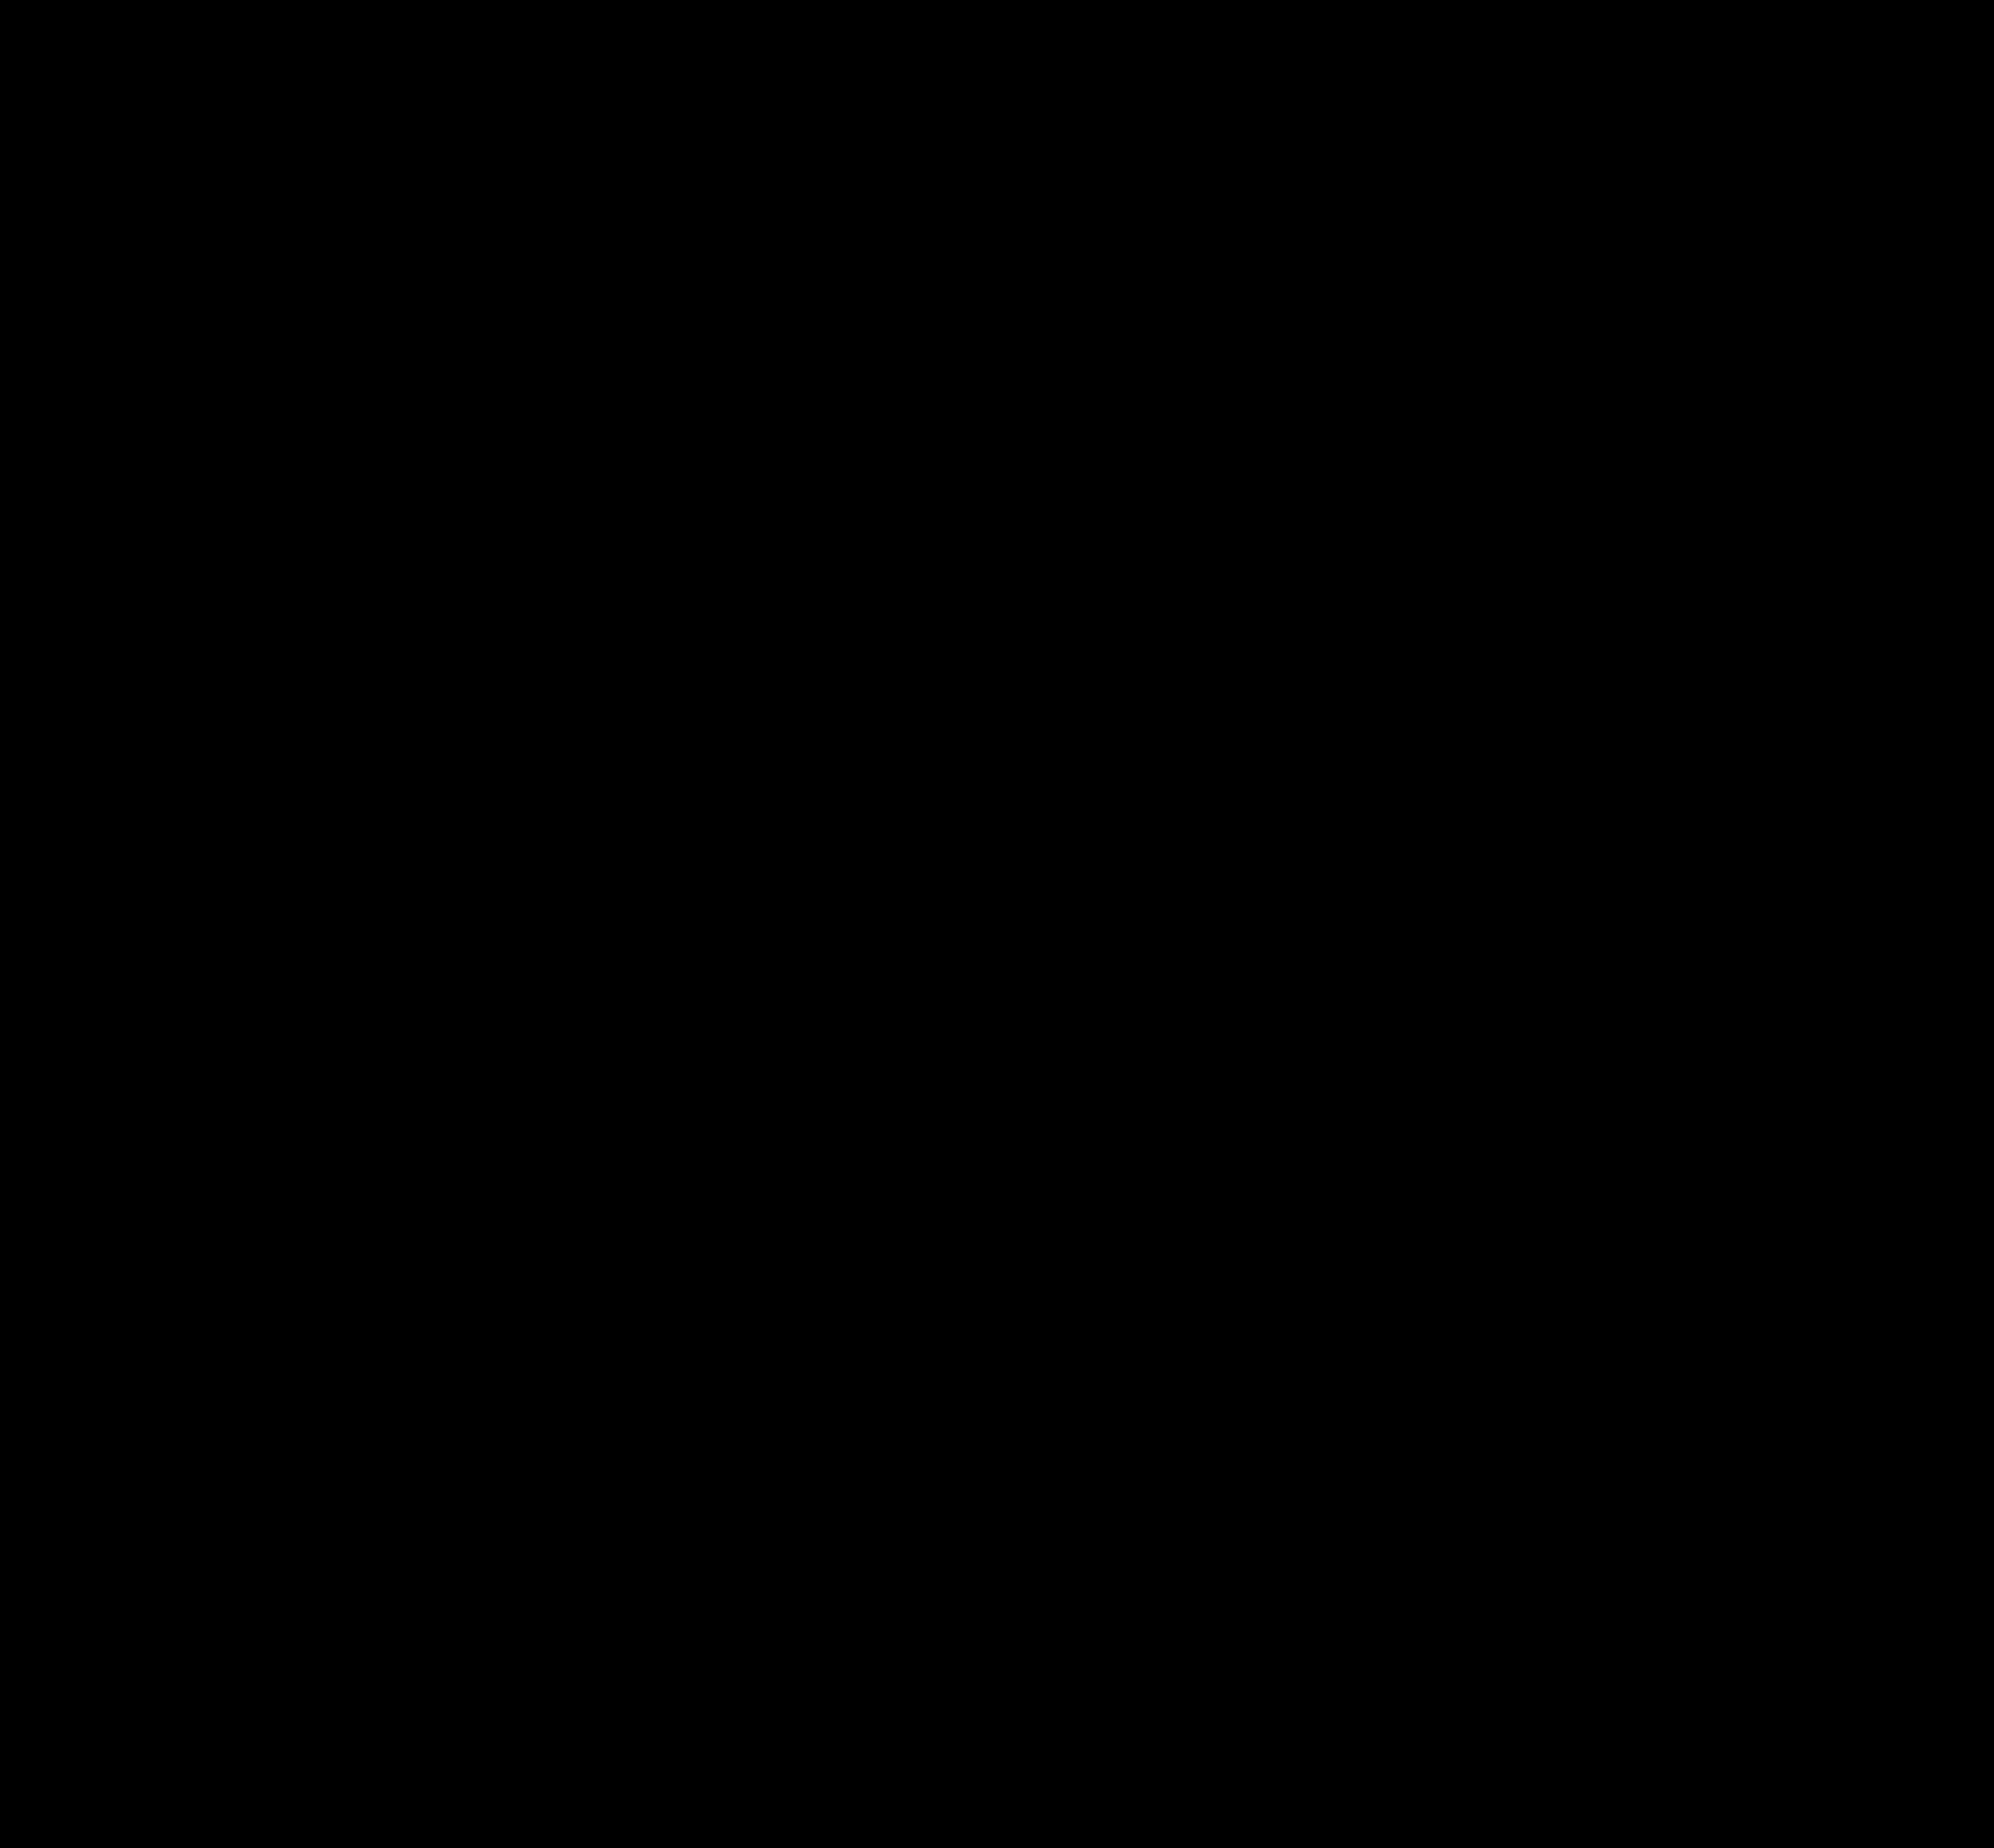 Black Heart Emoji Png (+).